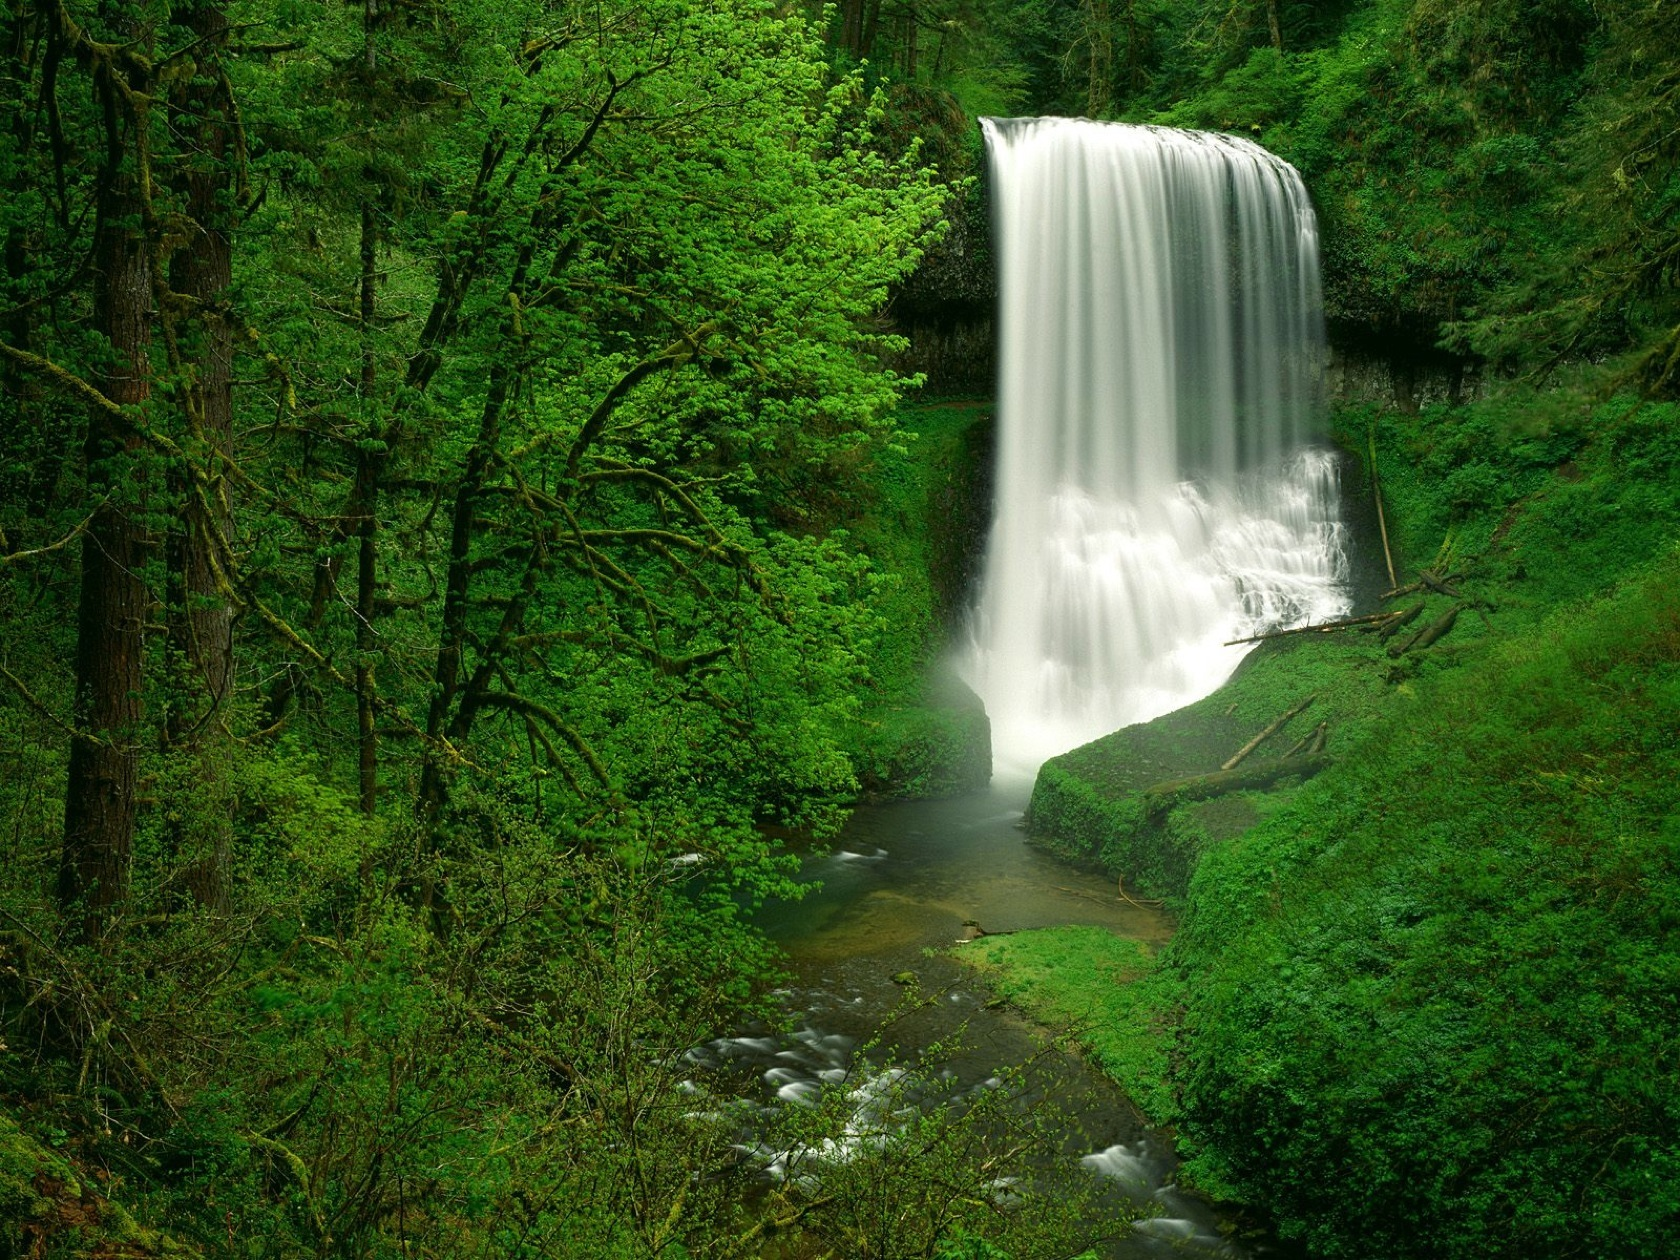 Niagara Falls Hd Wallpaper For Desktop Waterfall Wallpapers 1080p Hd Desktop Wallpapers 4k Hd